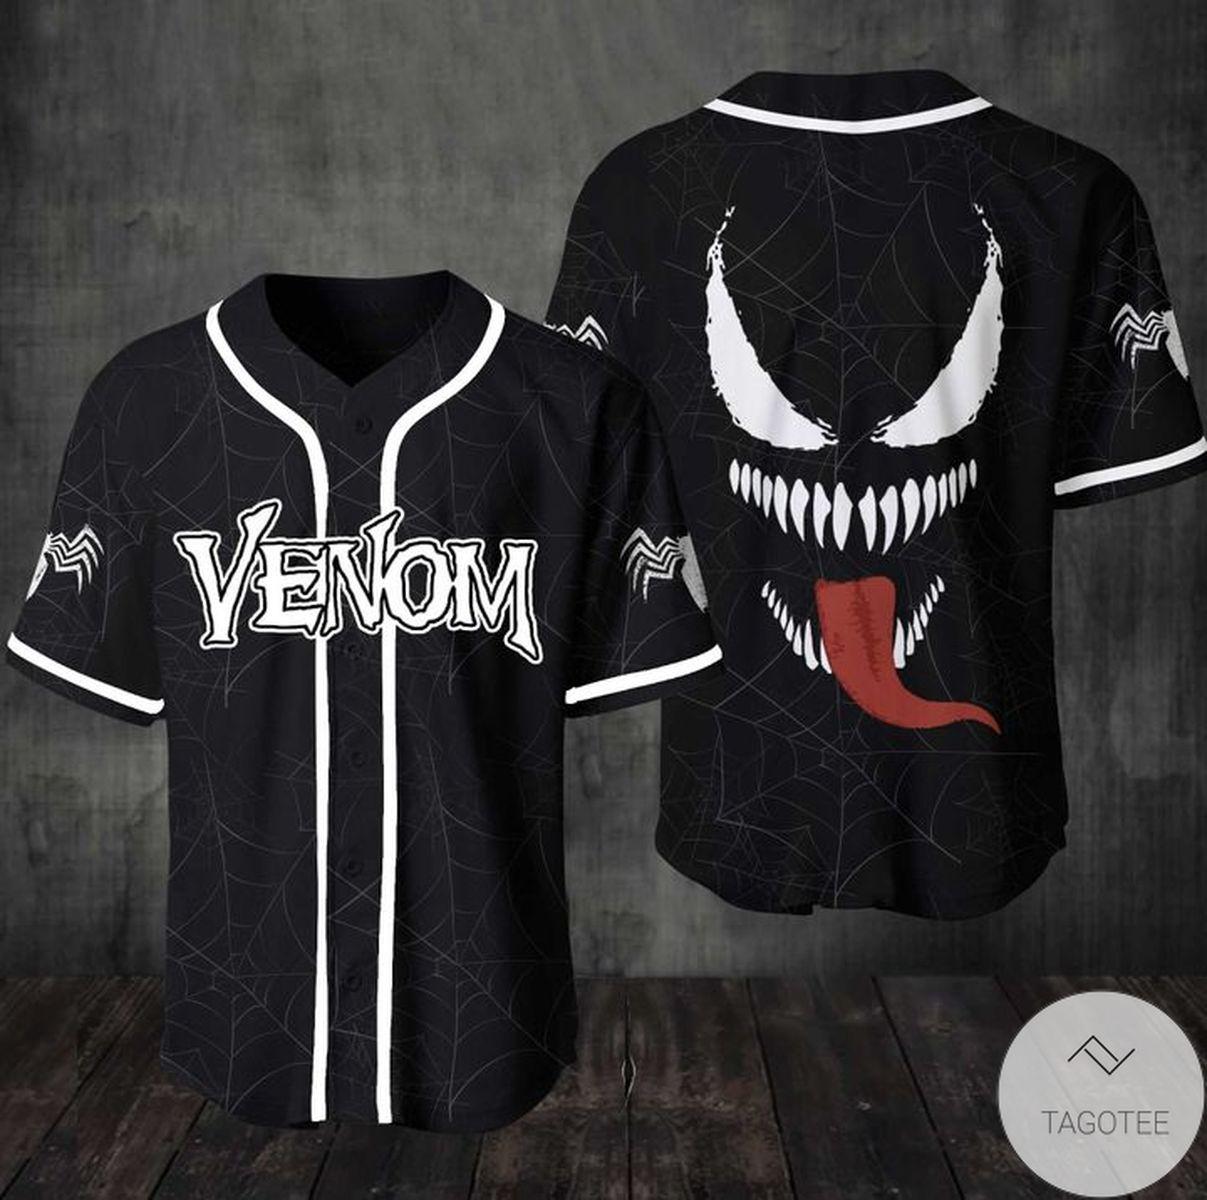 Awesome Venom Jersey Baseball Jersey